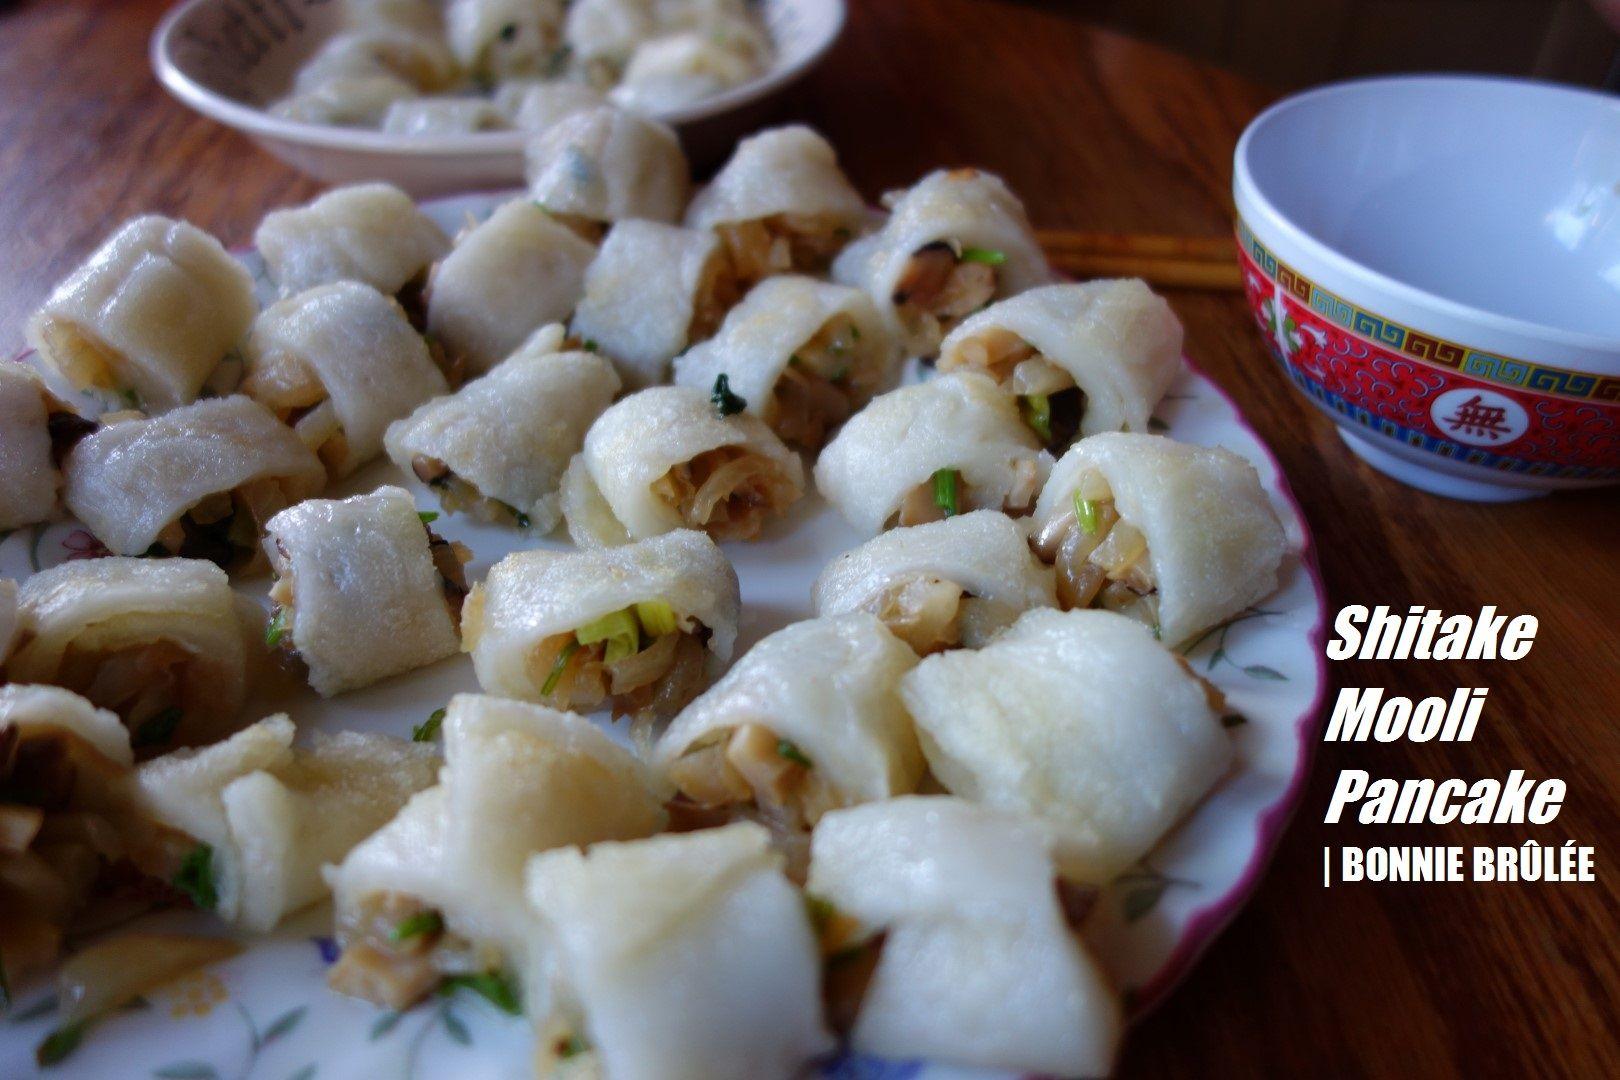 Shitake and Mooli Pancakes | I want to eat | Pinterest